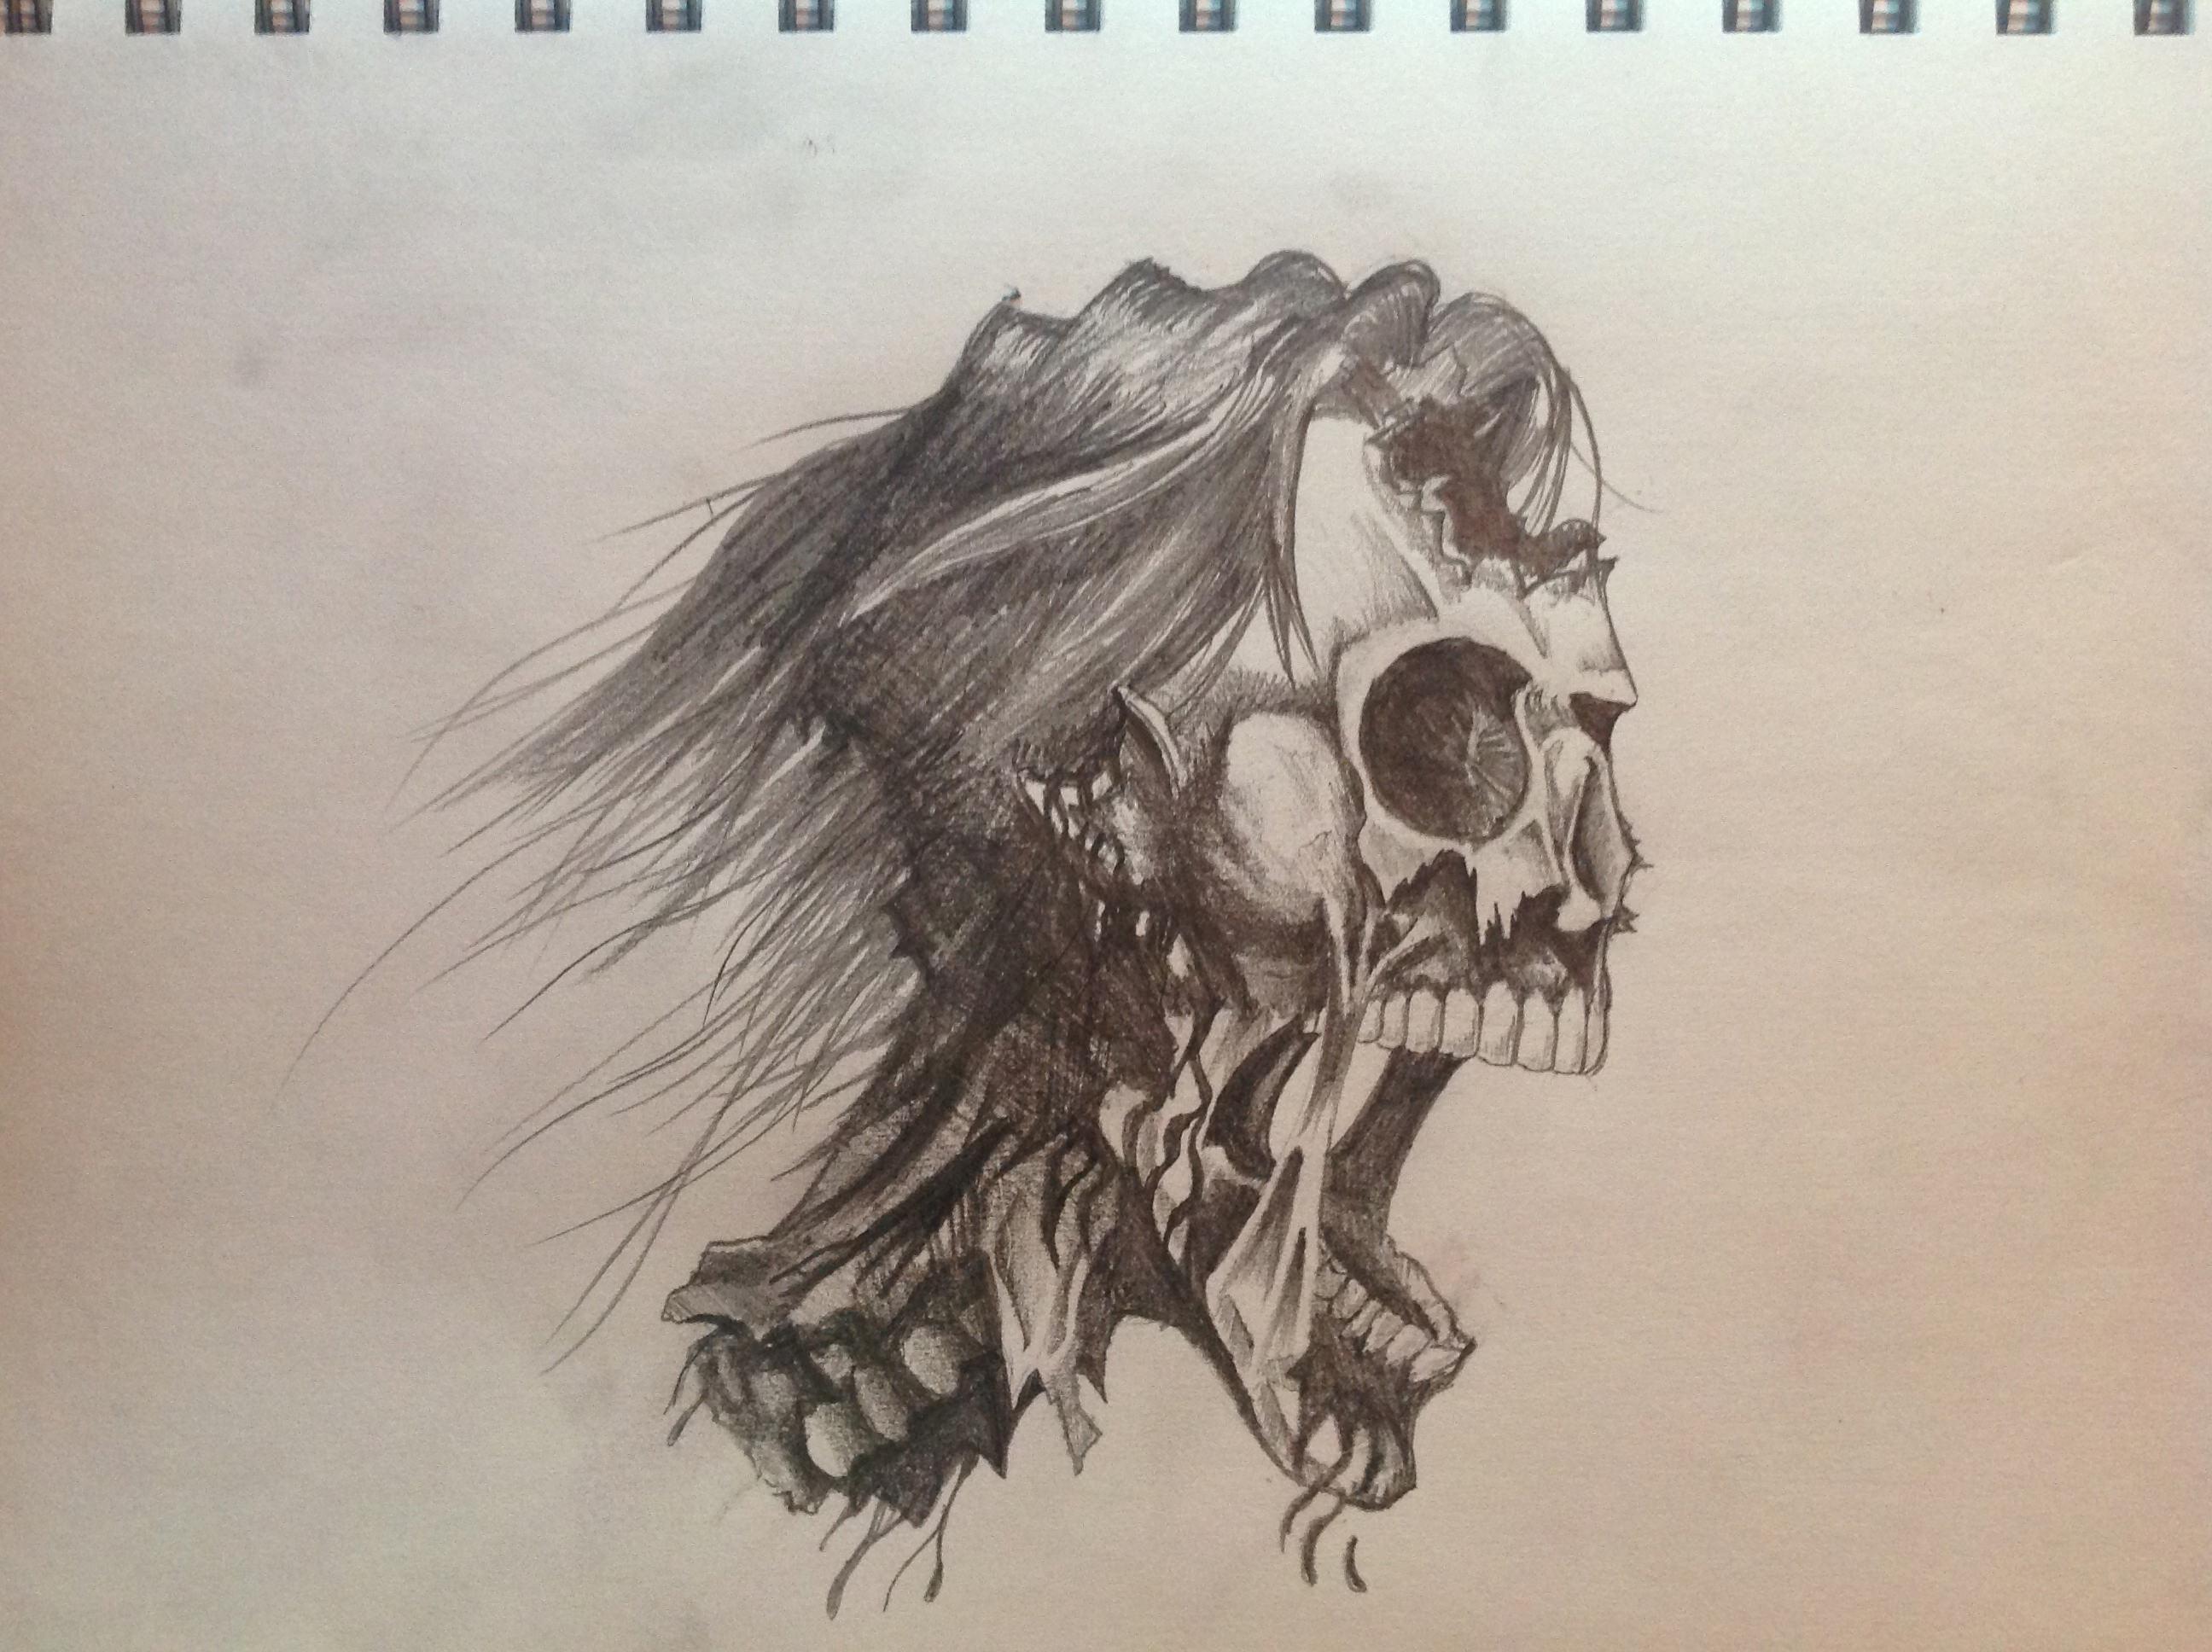 2592x1936 Skull Drawings, Art Ideas Design Trends